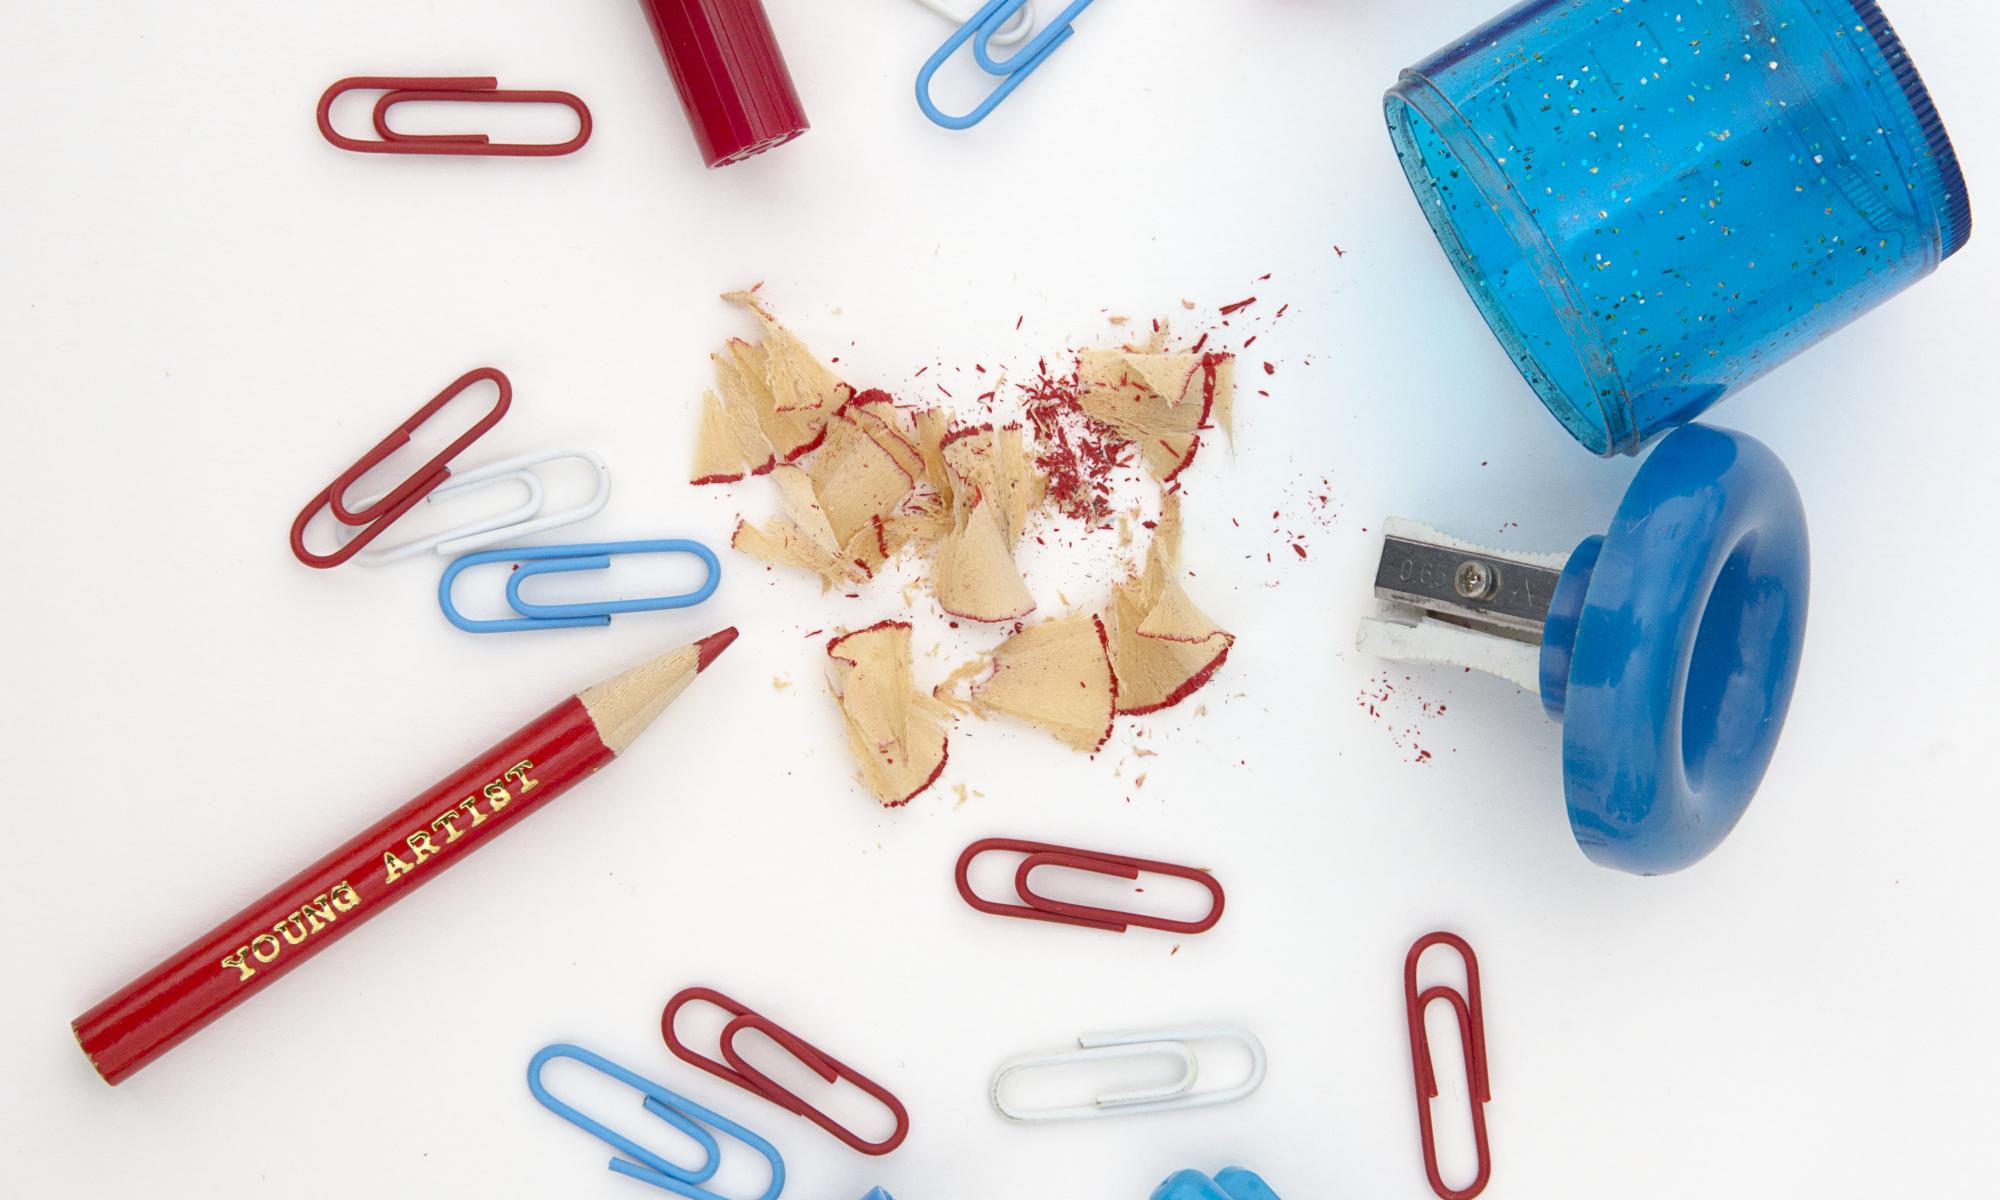 pens pencils paperclips